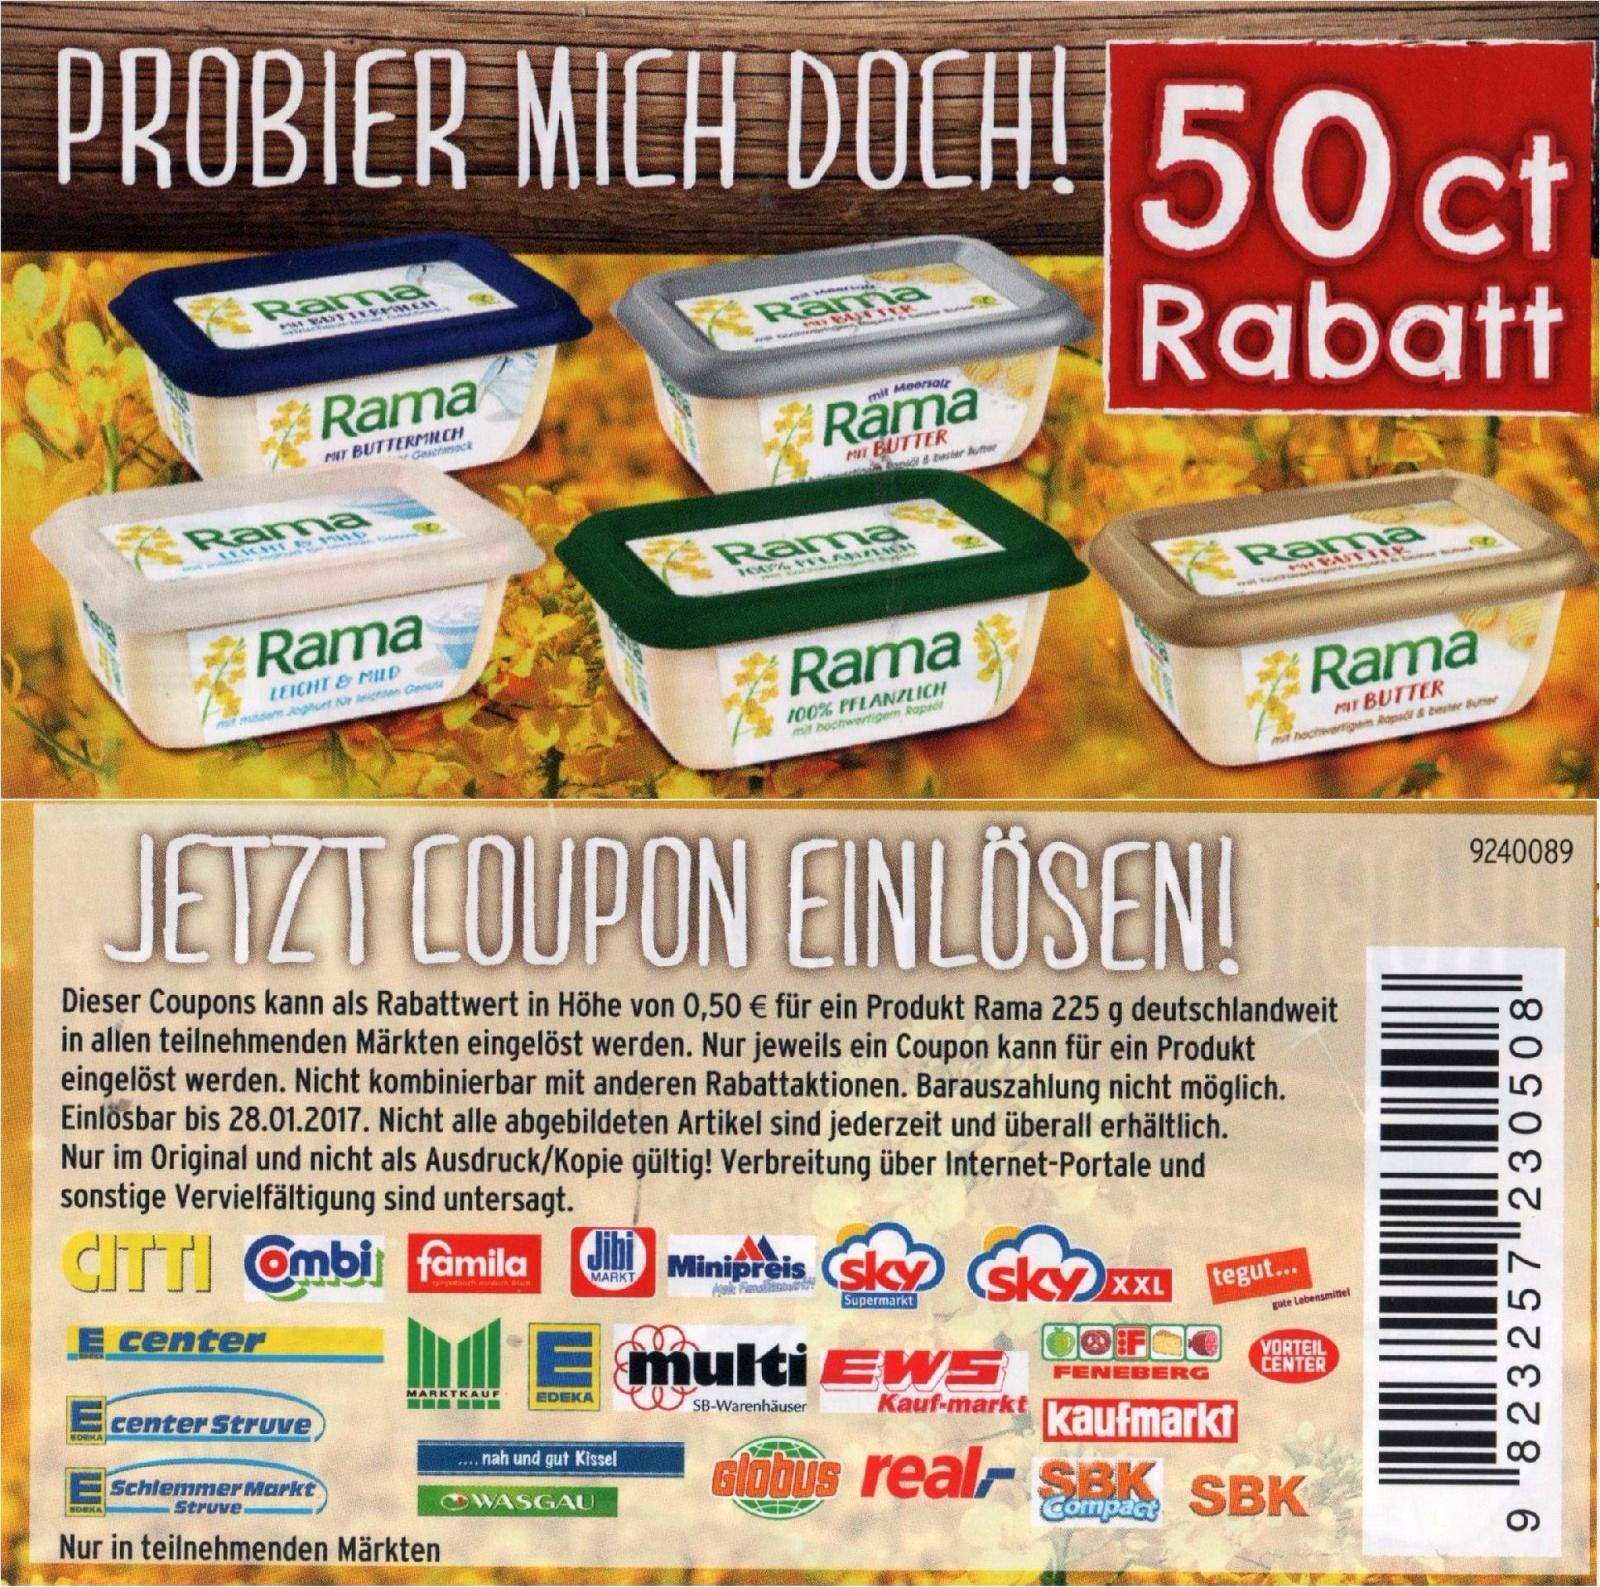 Lebensmittel rabatt coupons